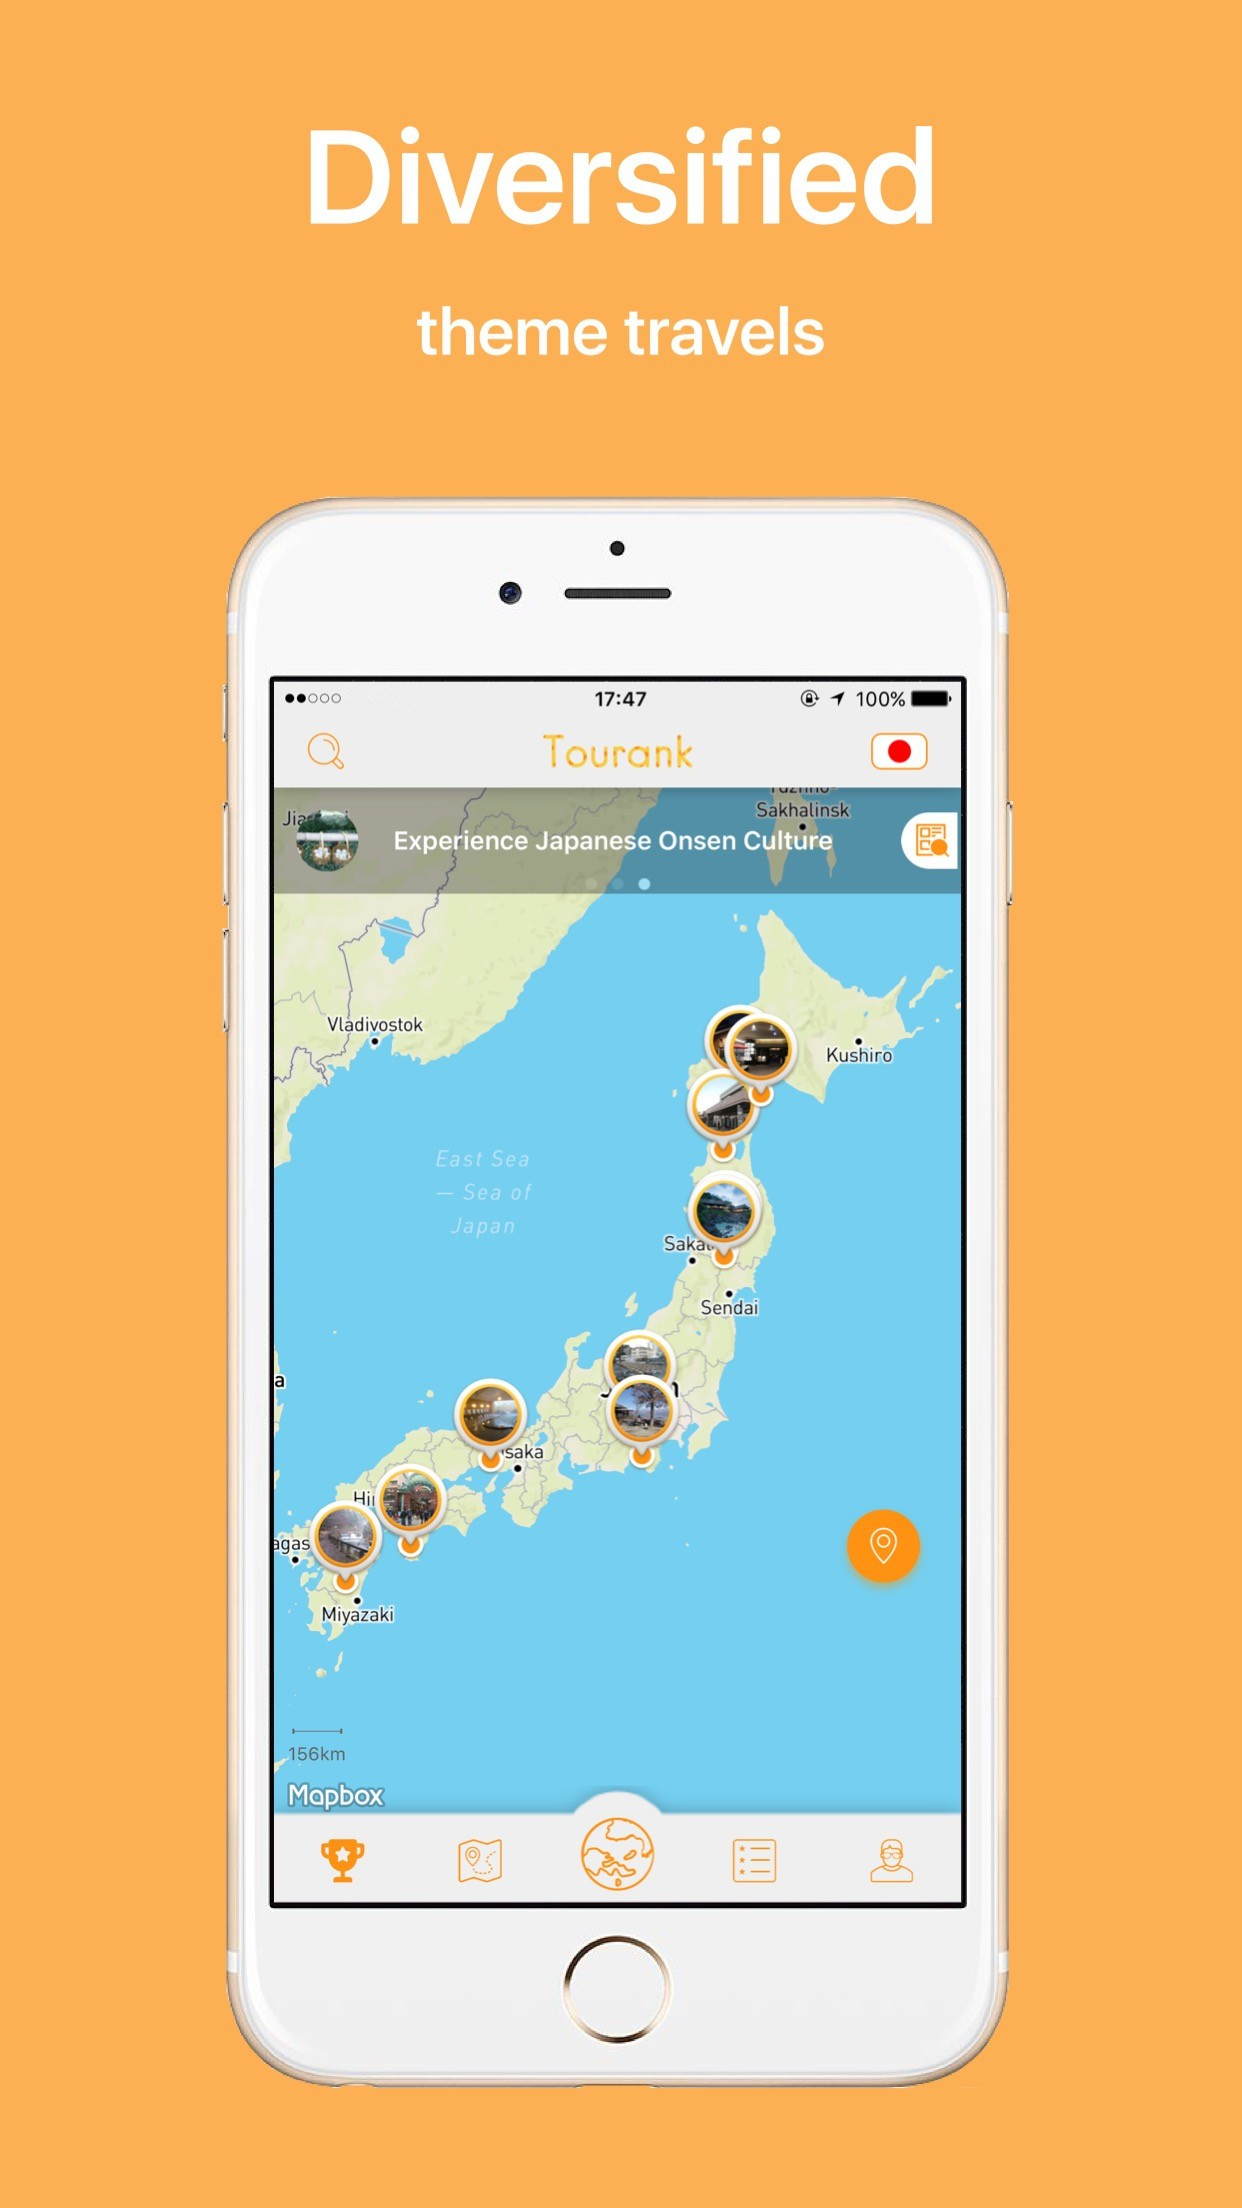 Tourank Smart Mobile Travel Guide on Japan